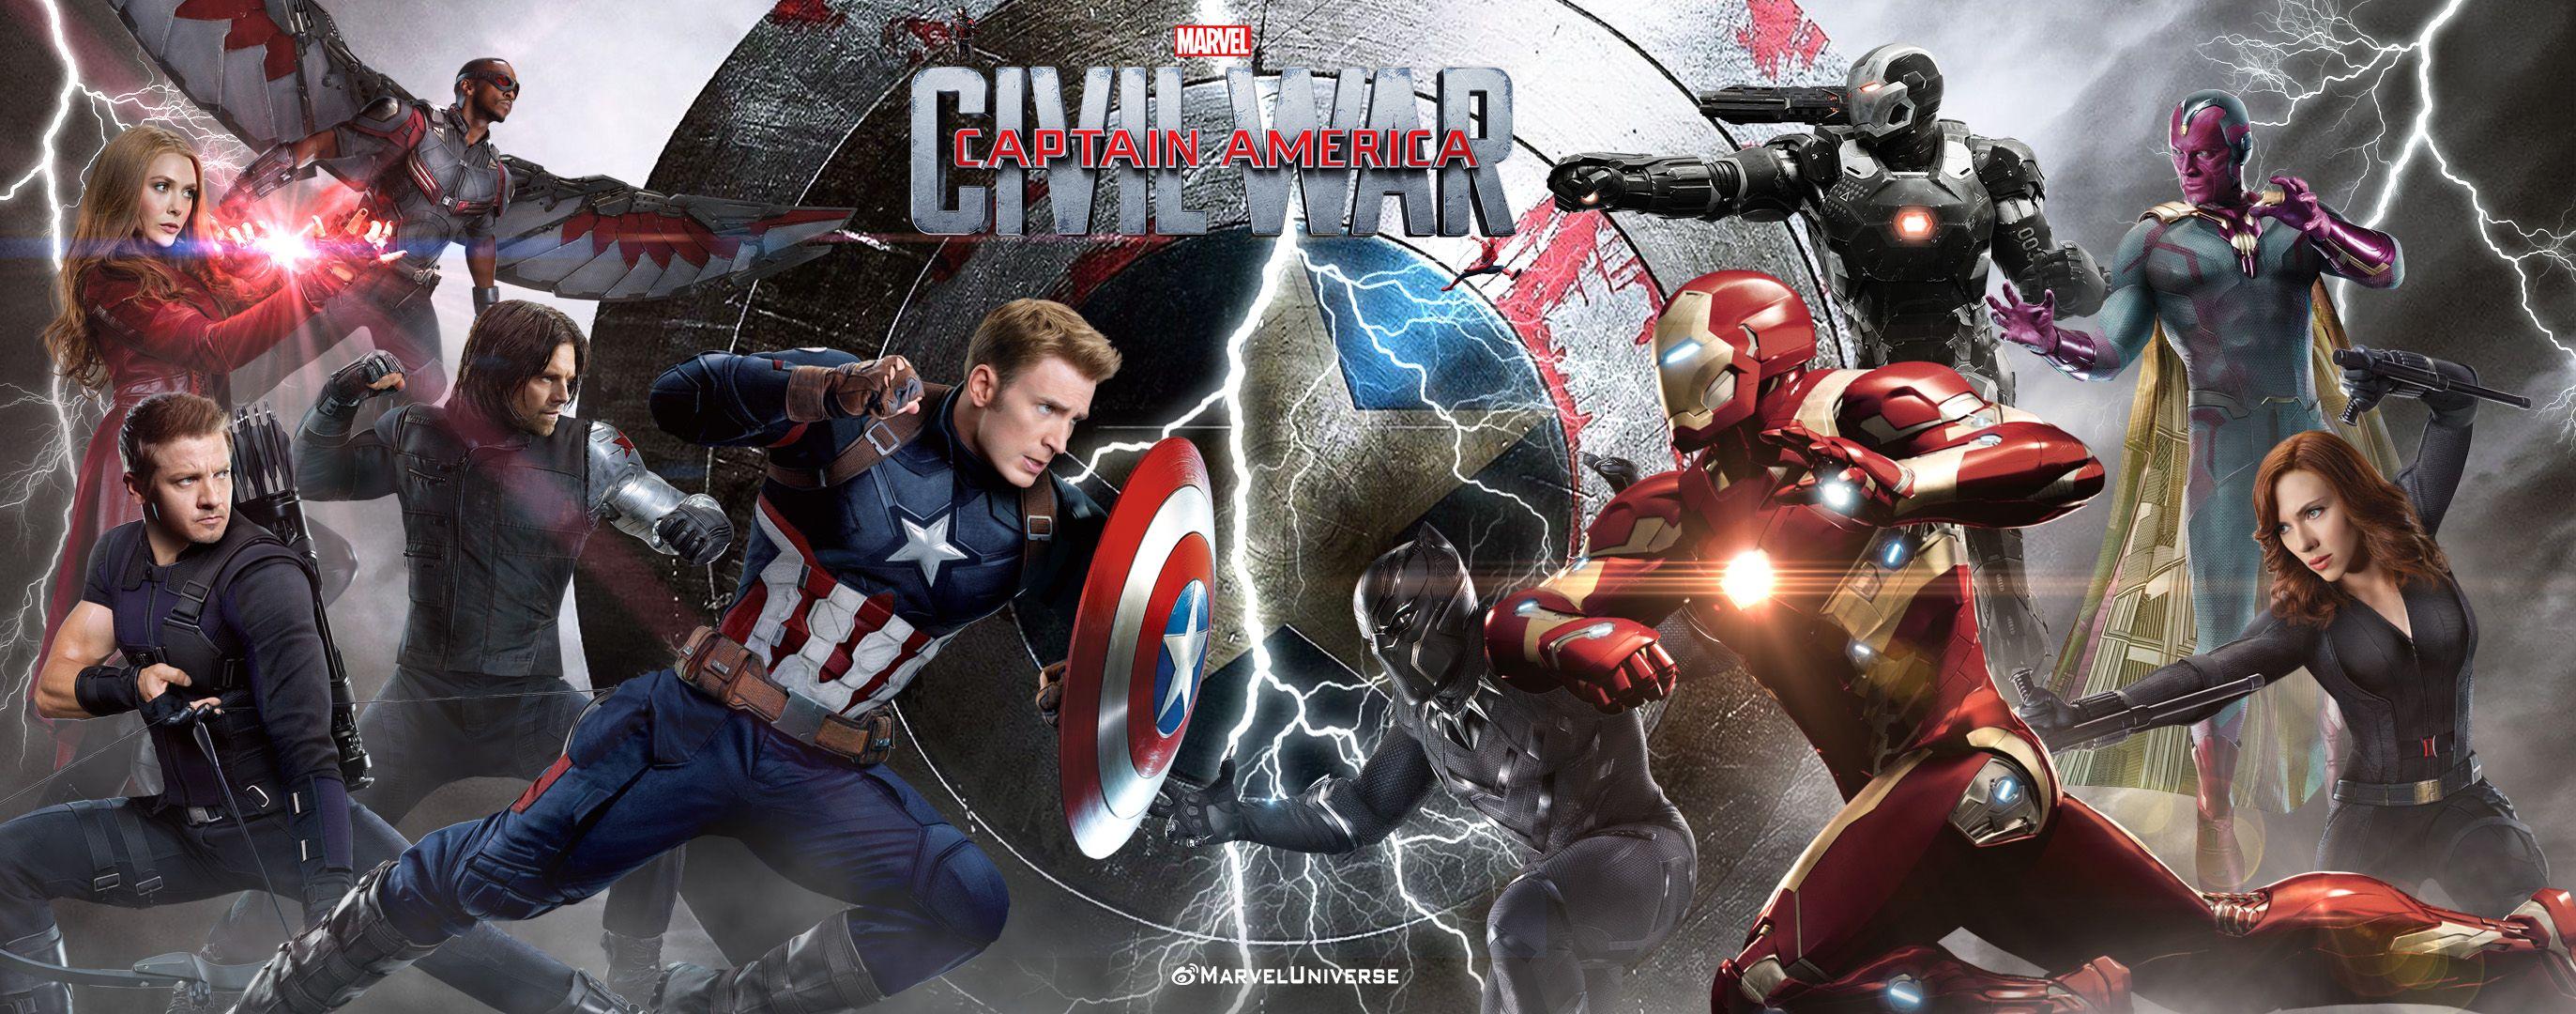 Smashing HD Wallpapers Of Captain America Civil War